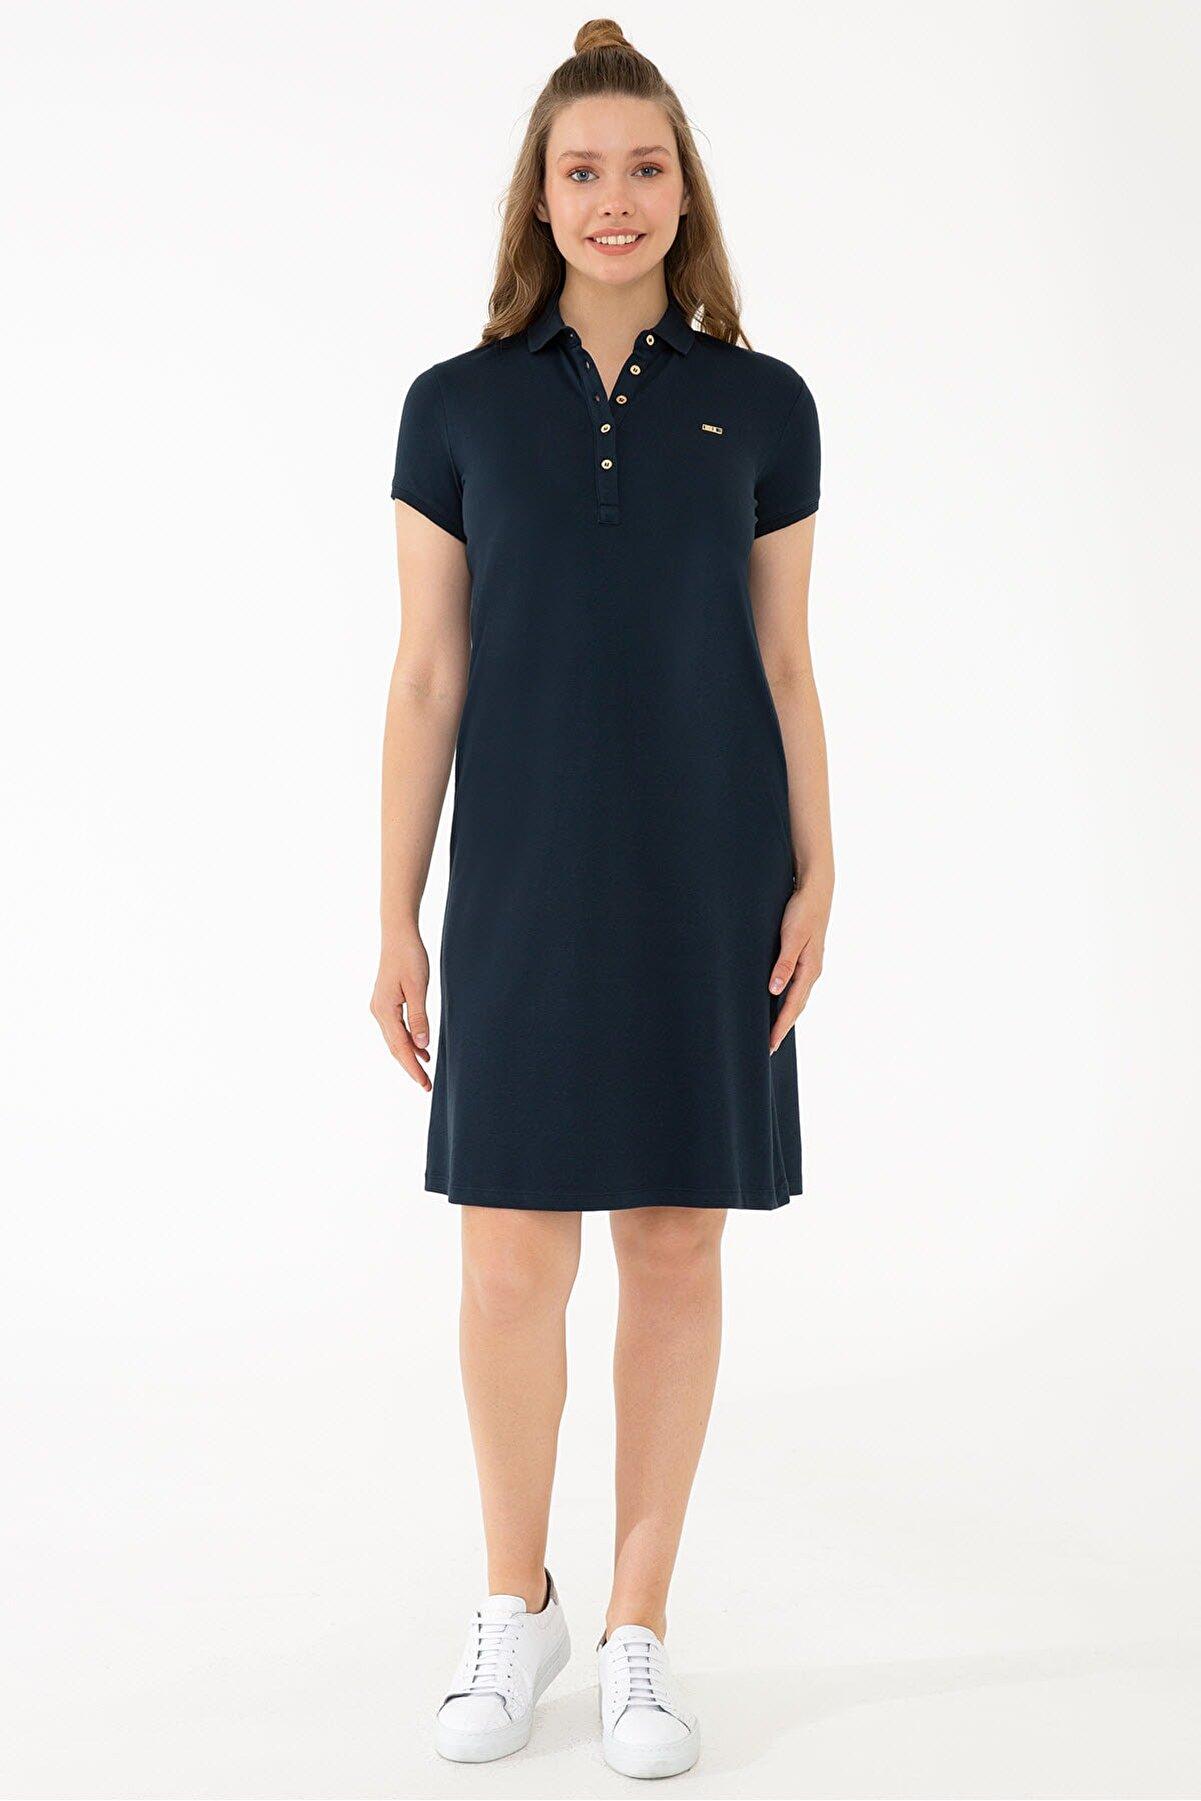 US Polo Assn Lacivert Kadın Elbise